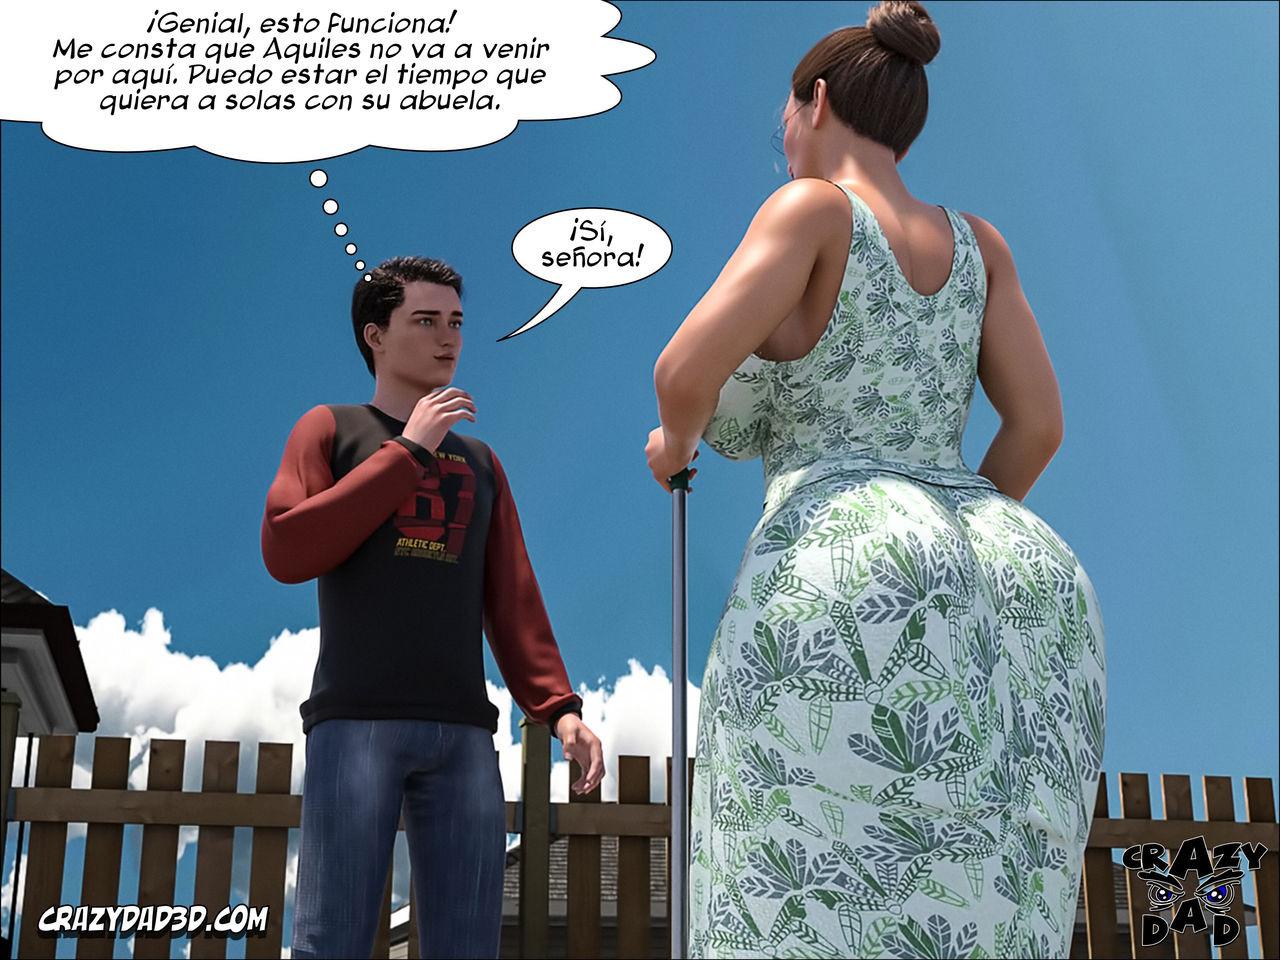 The GRANDMA parte 9